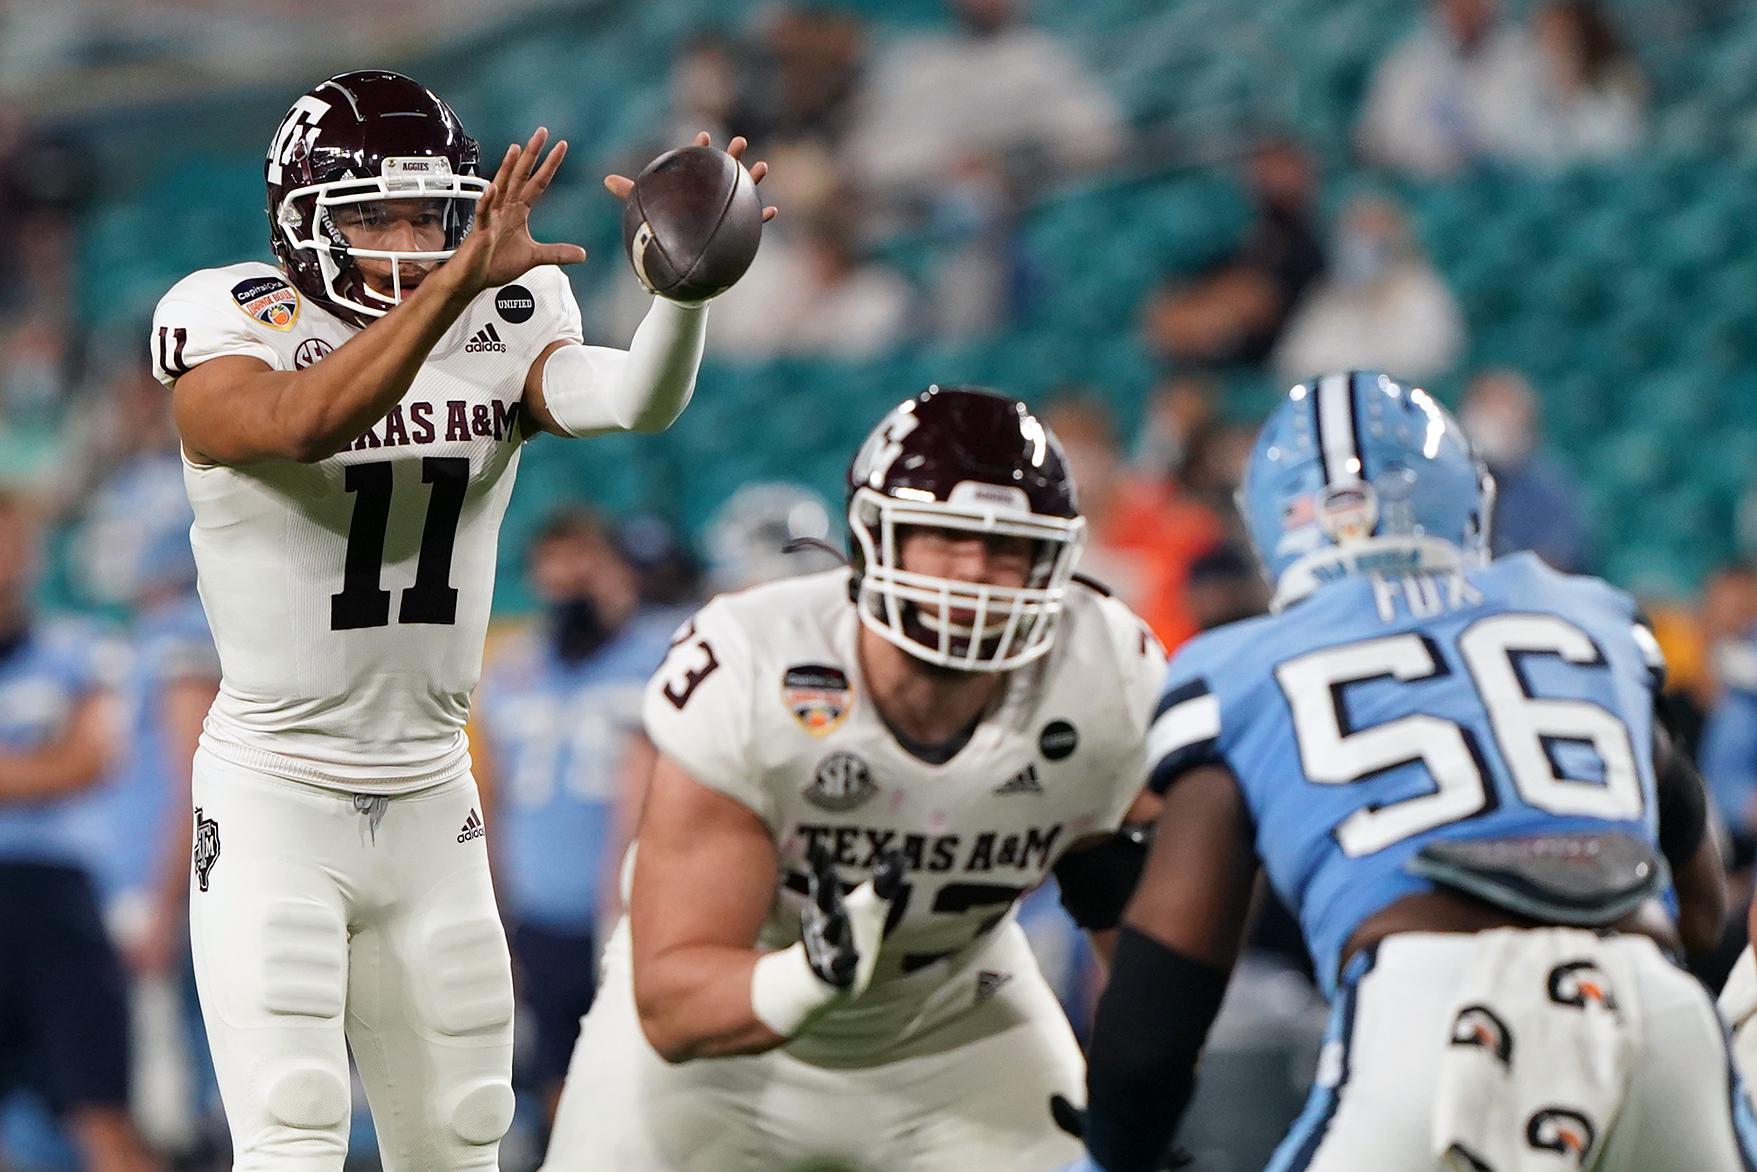 Texas A&M Aggies quarterback Kellen Mond takes the snap during the first half North Carolina Tar Heels at Hard Rock Stadium.